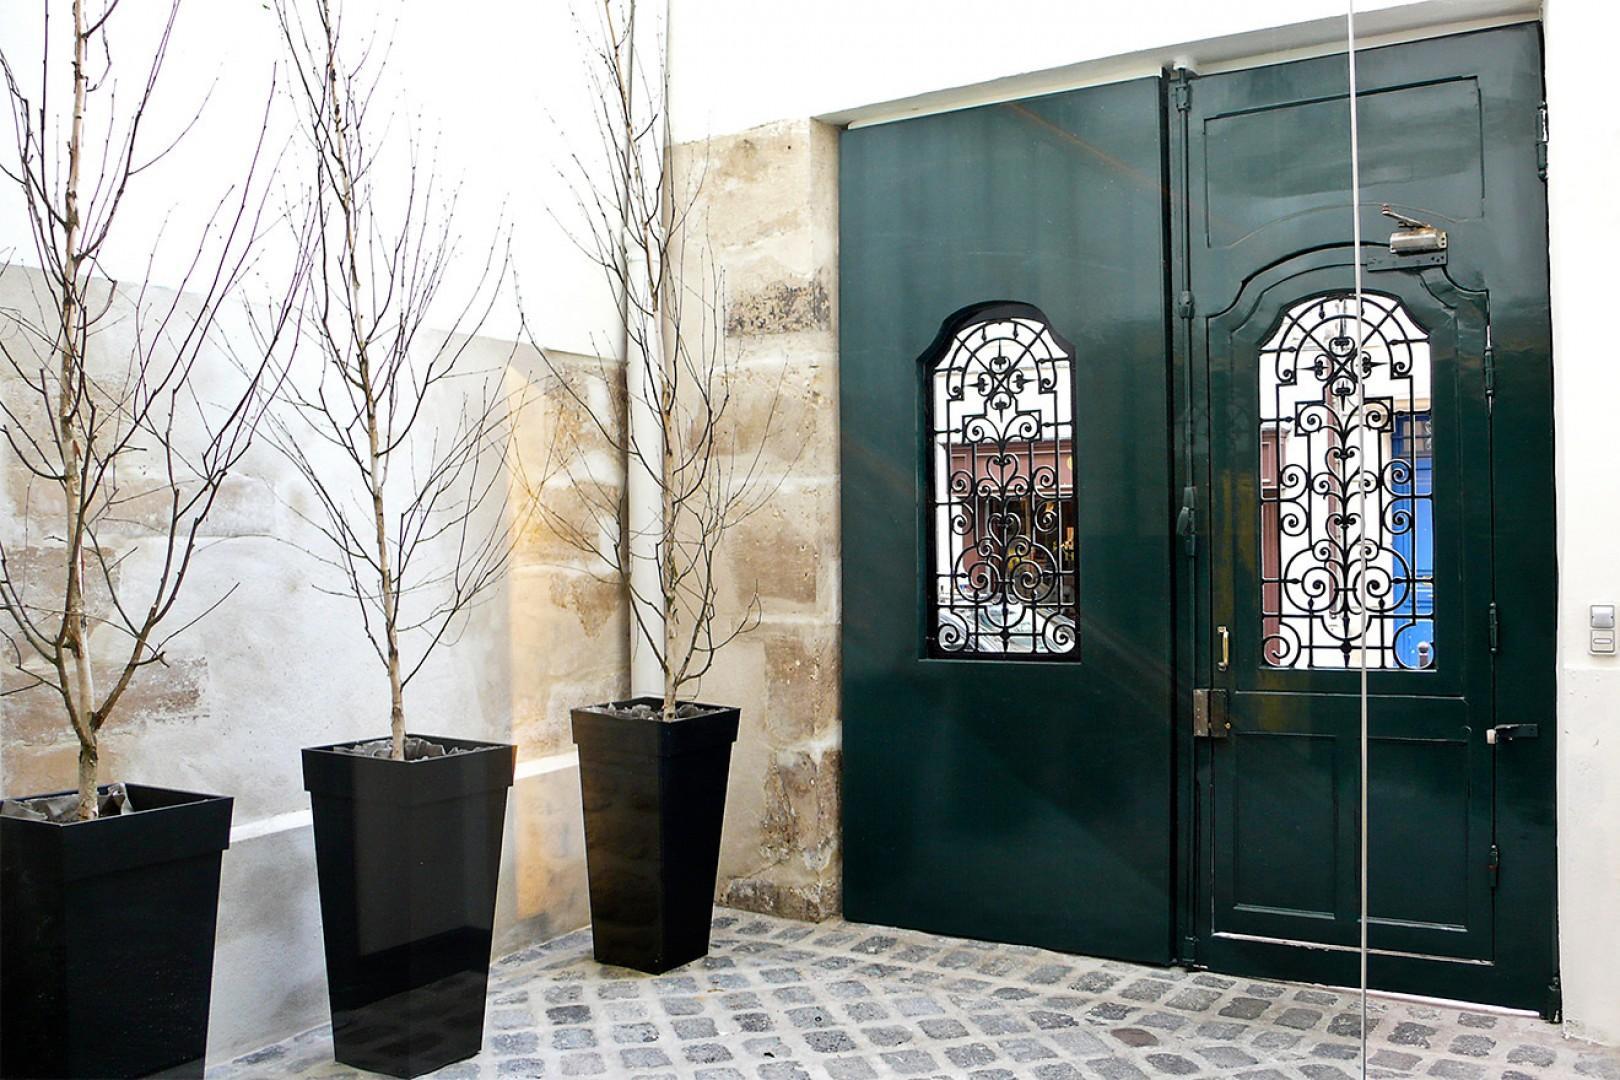 Enter through old wooden doors to a cobblestone courtyard.